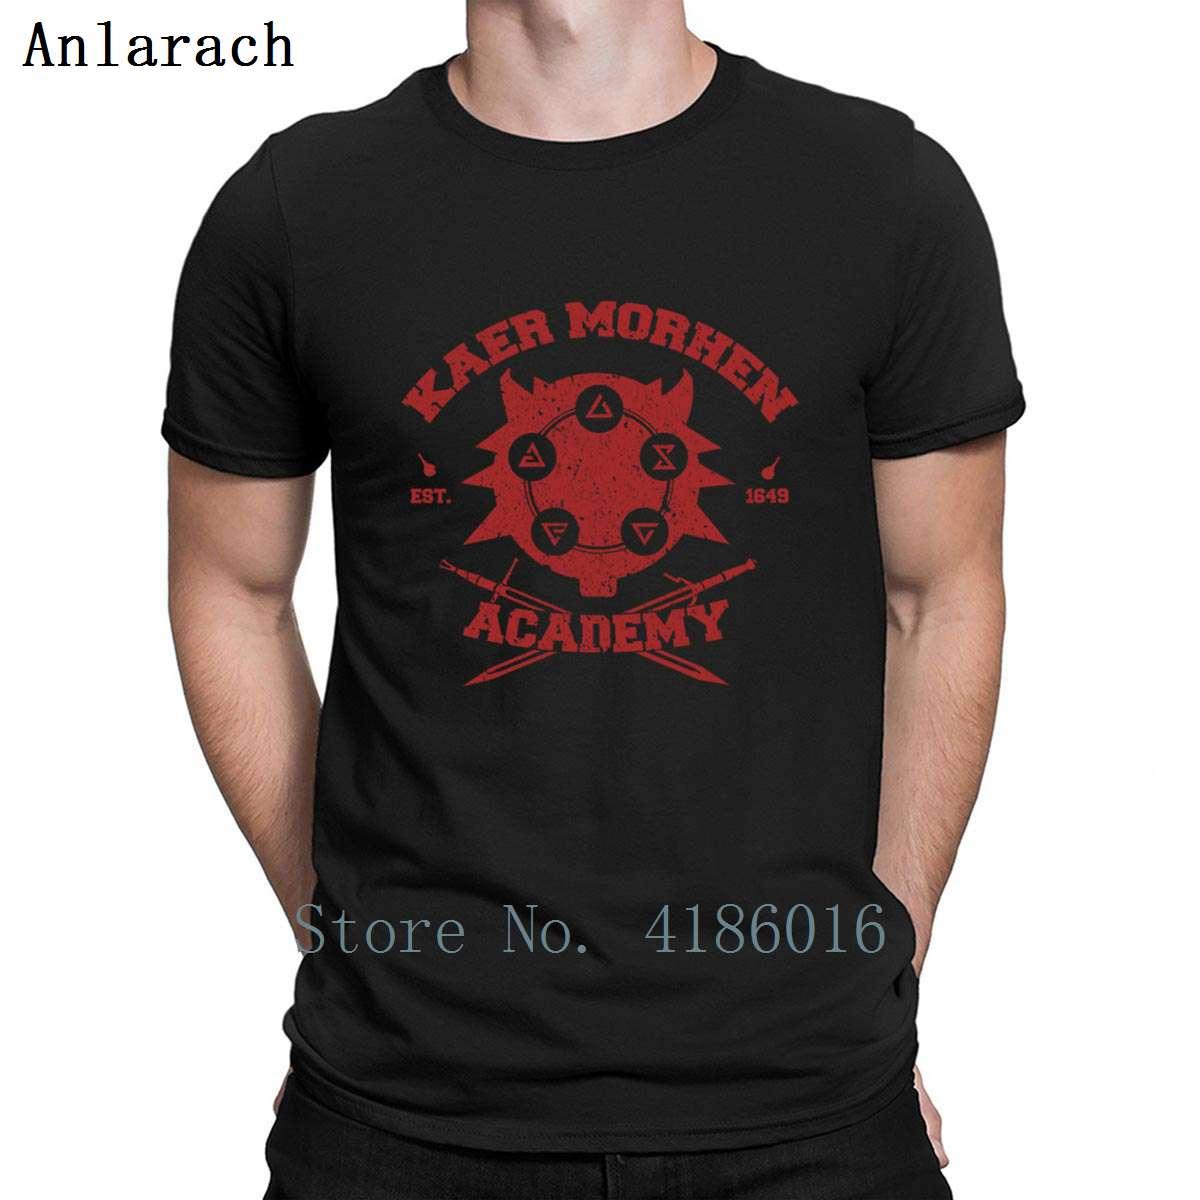 Kaer Morhen Of The School Academy T Shirt Slim Spring Autumn Fitness Authentic Designs Cotton Unisex S-XXXXXL Shirt